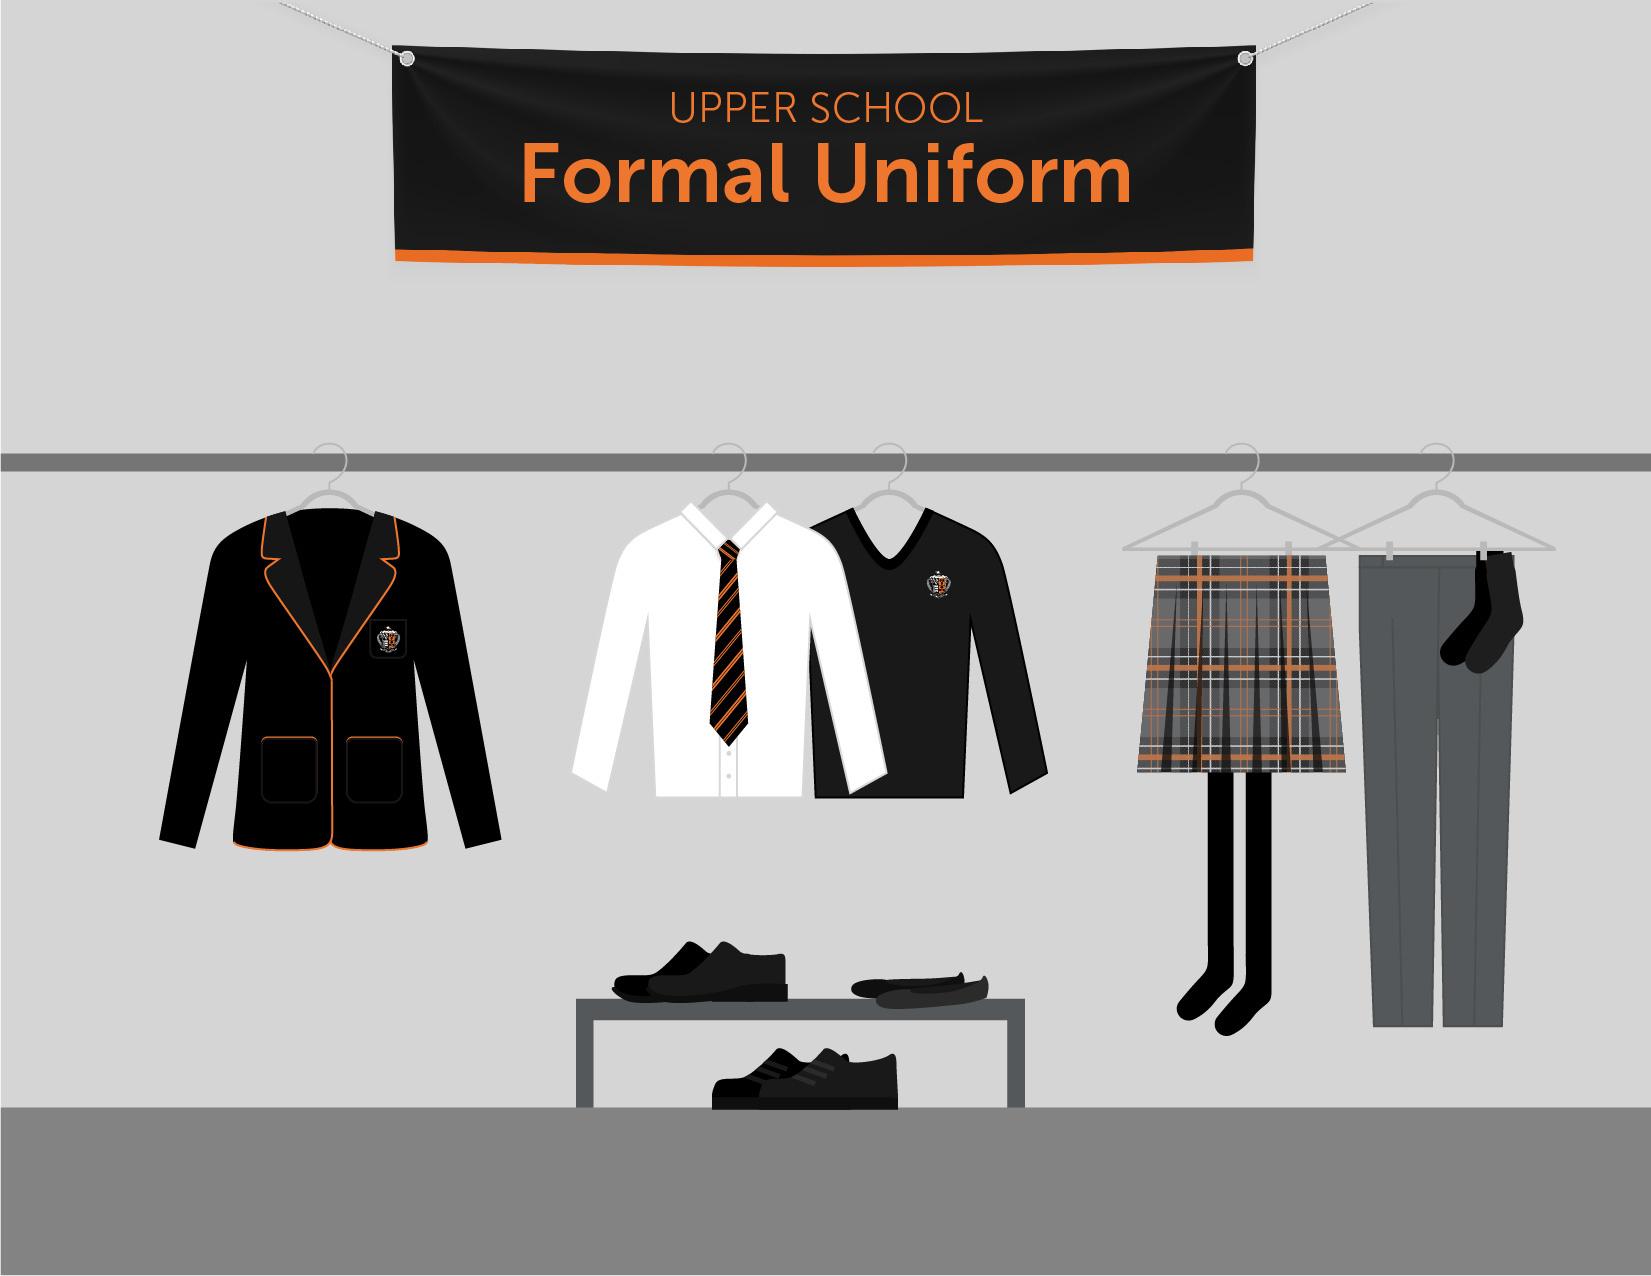 Formal Uniform Visual